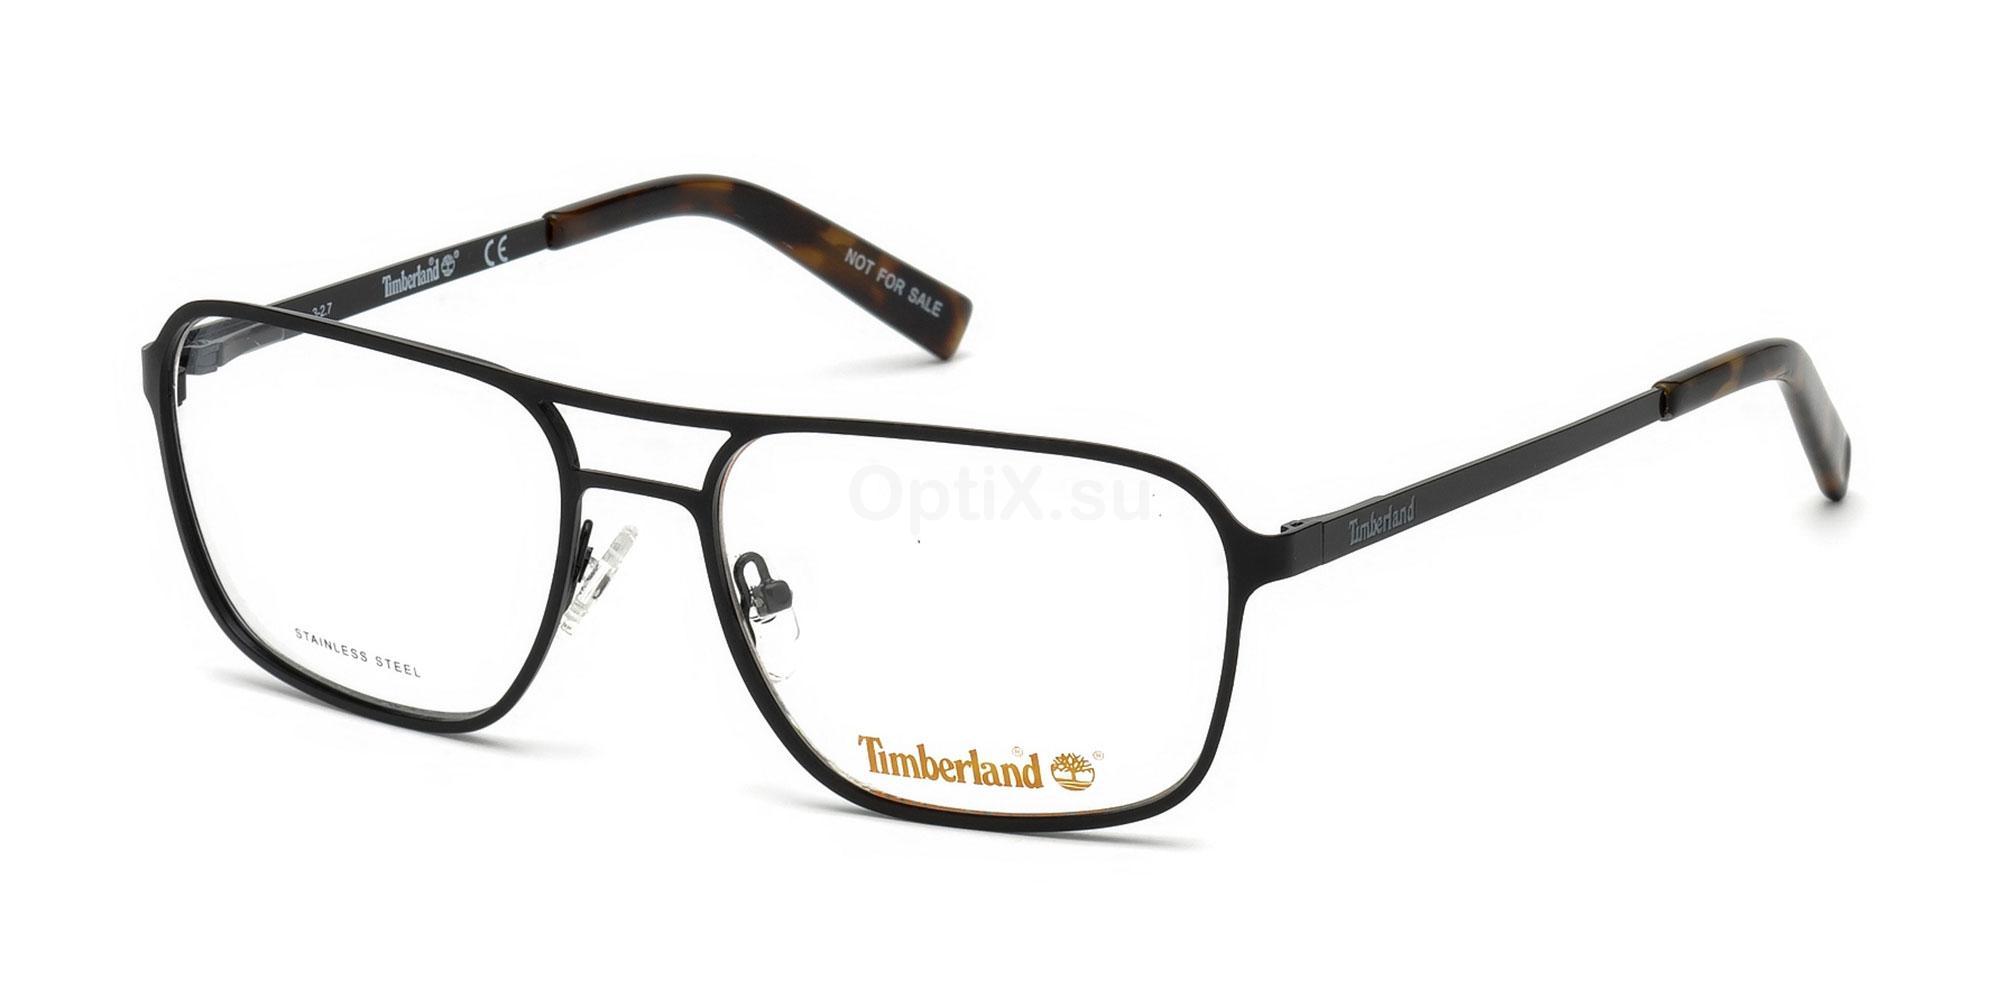 002 TB1593 Glasses, Timberland